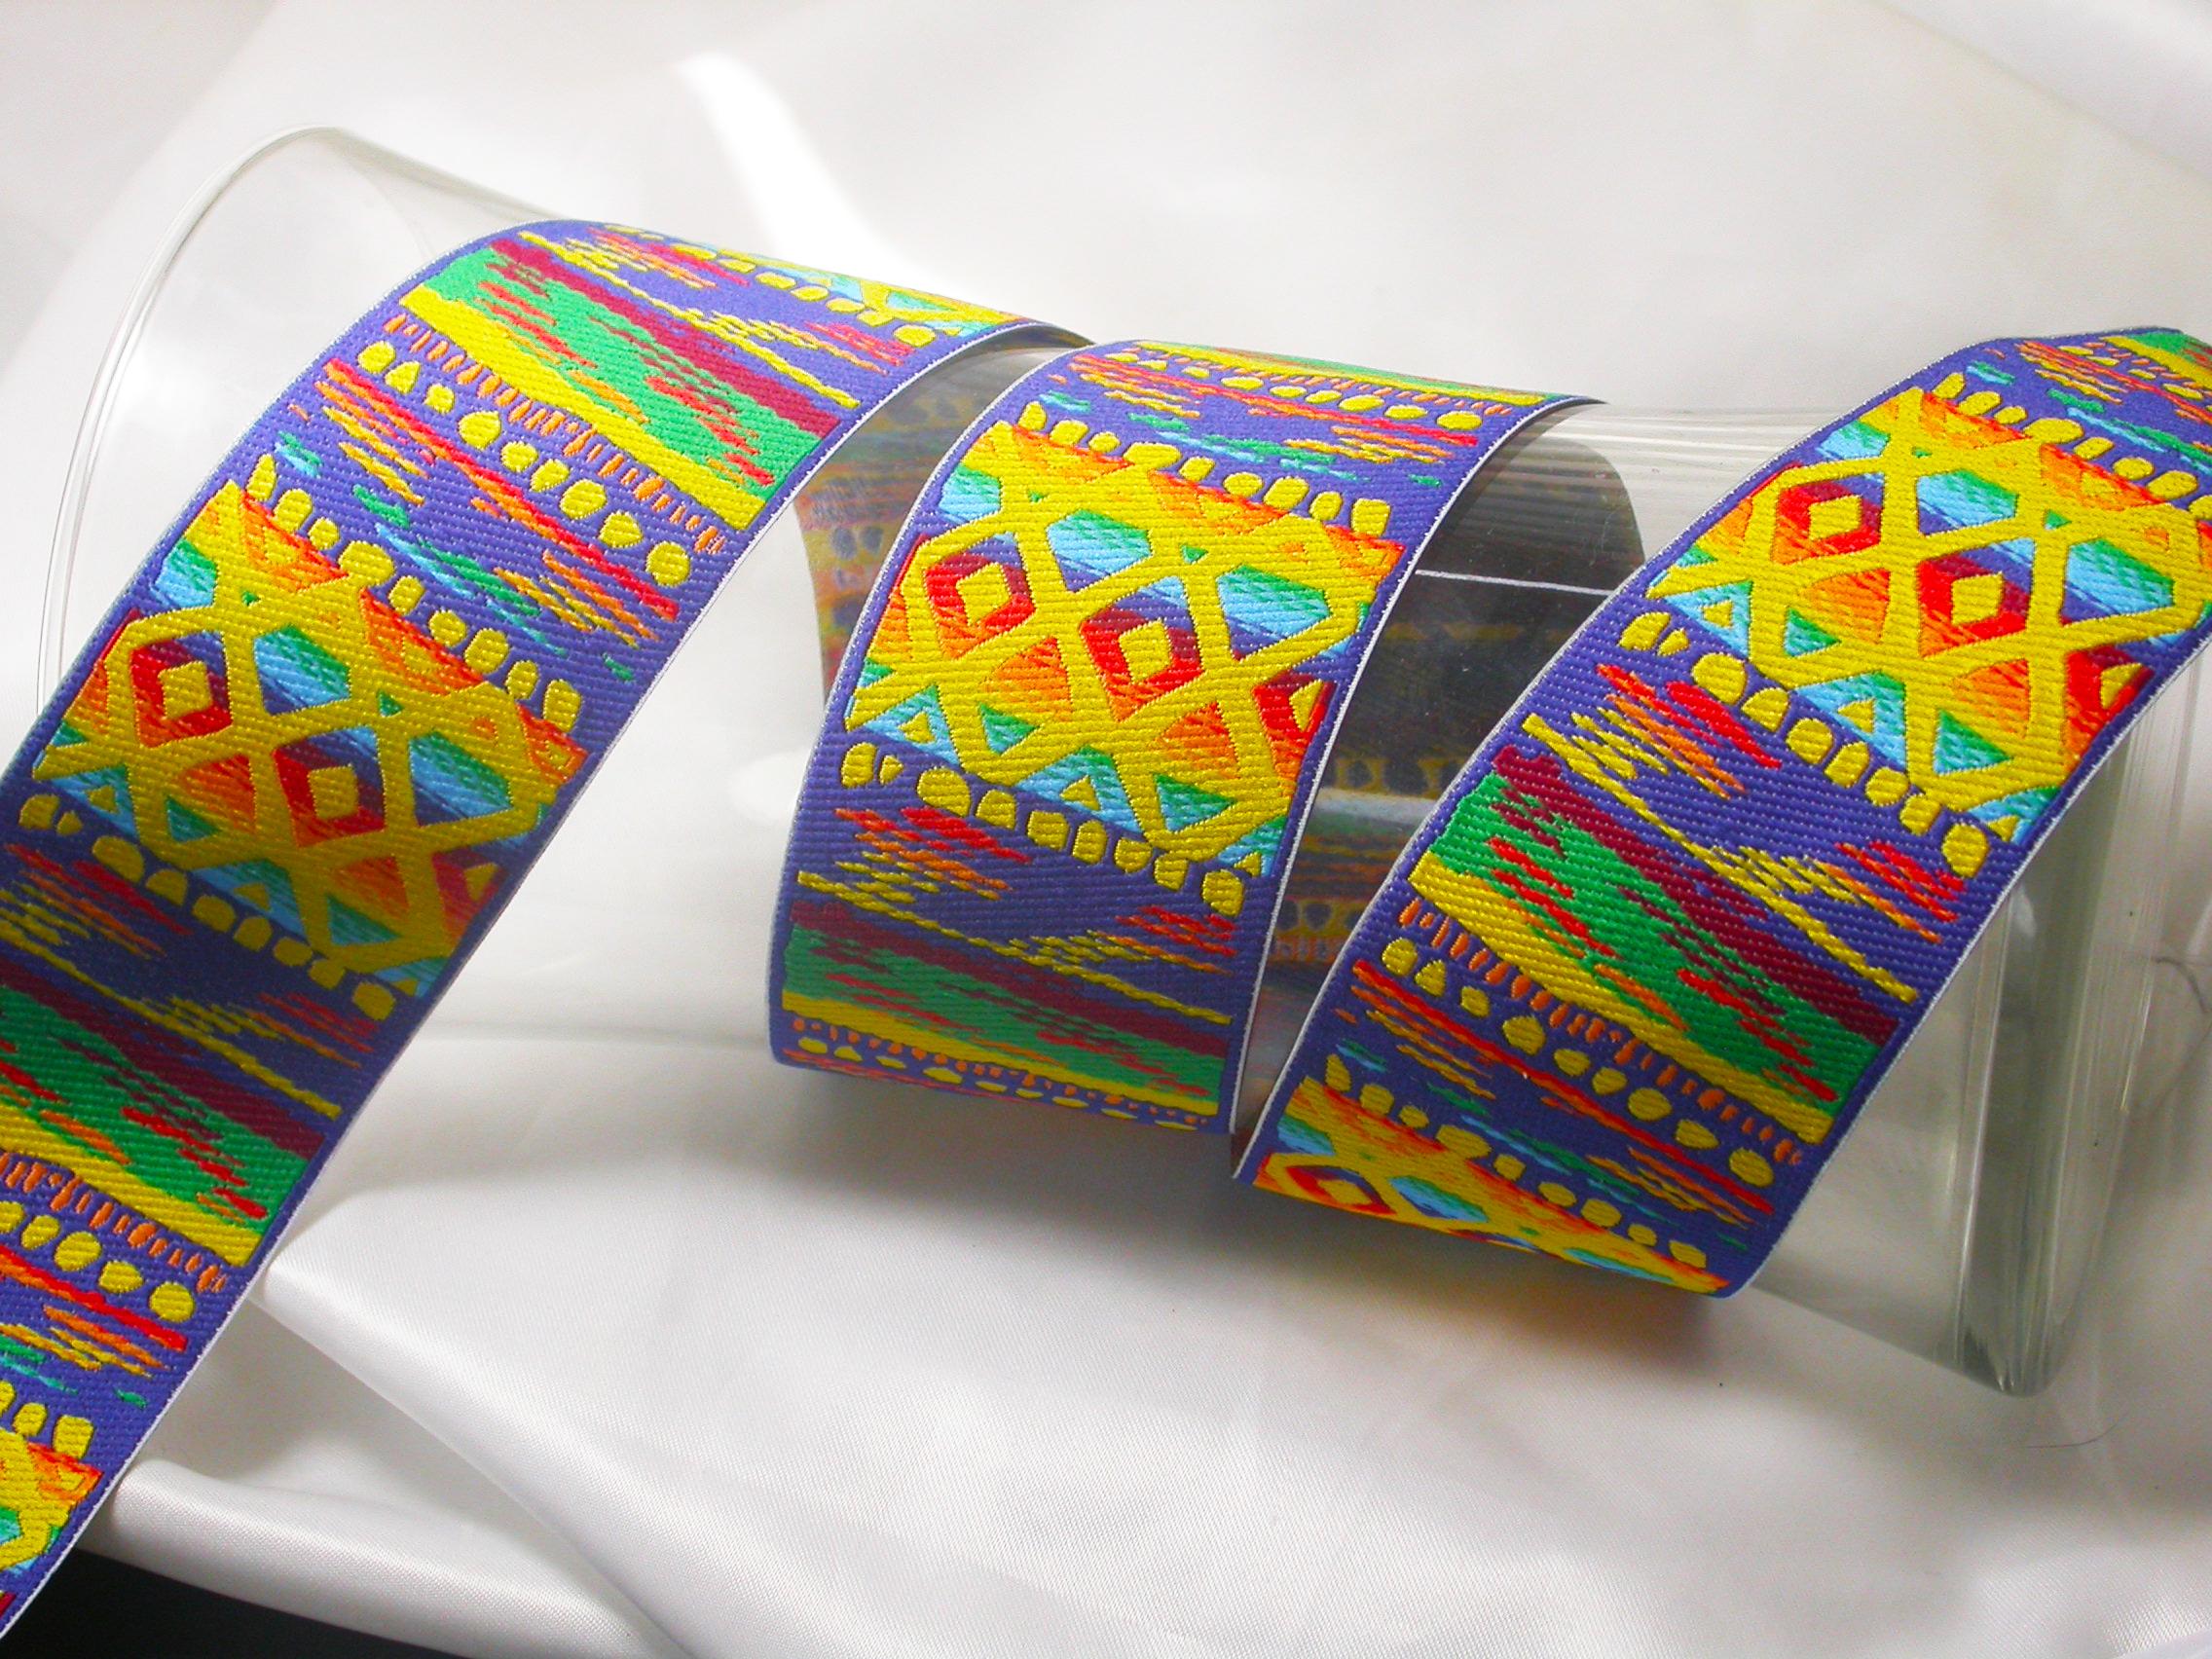 "Jacquard Ribbon 2"" Rainbow Beach Priced Per Yard  Brilliant Bright Colors in an abstract modern beach pattern"